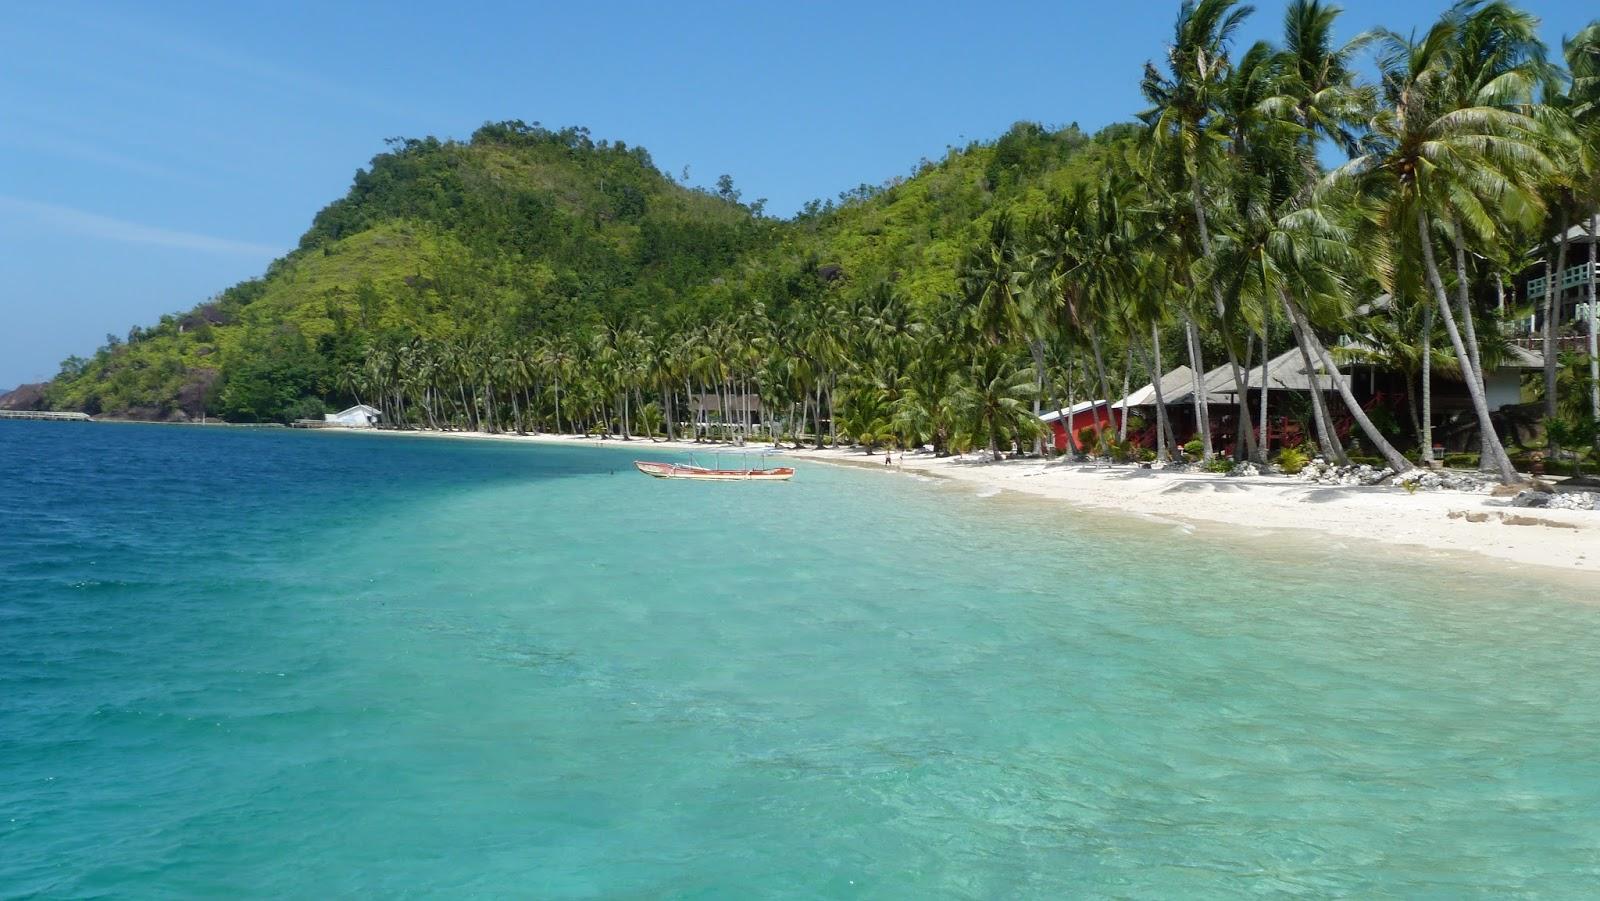 Carolina Beach Resort Is Located In The Beautiful Bungus Bay 20km South Of Padang West Sumatra Indonesia